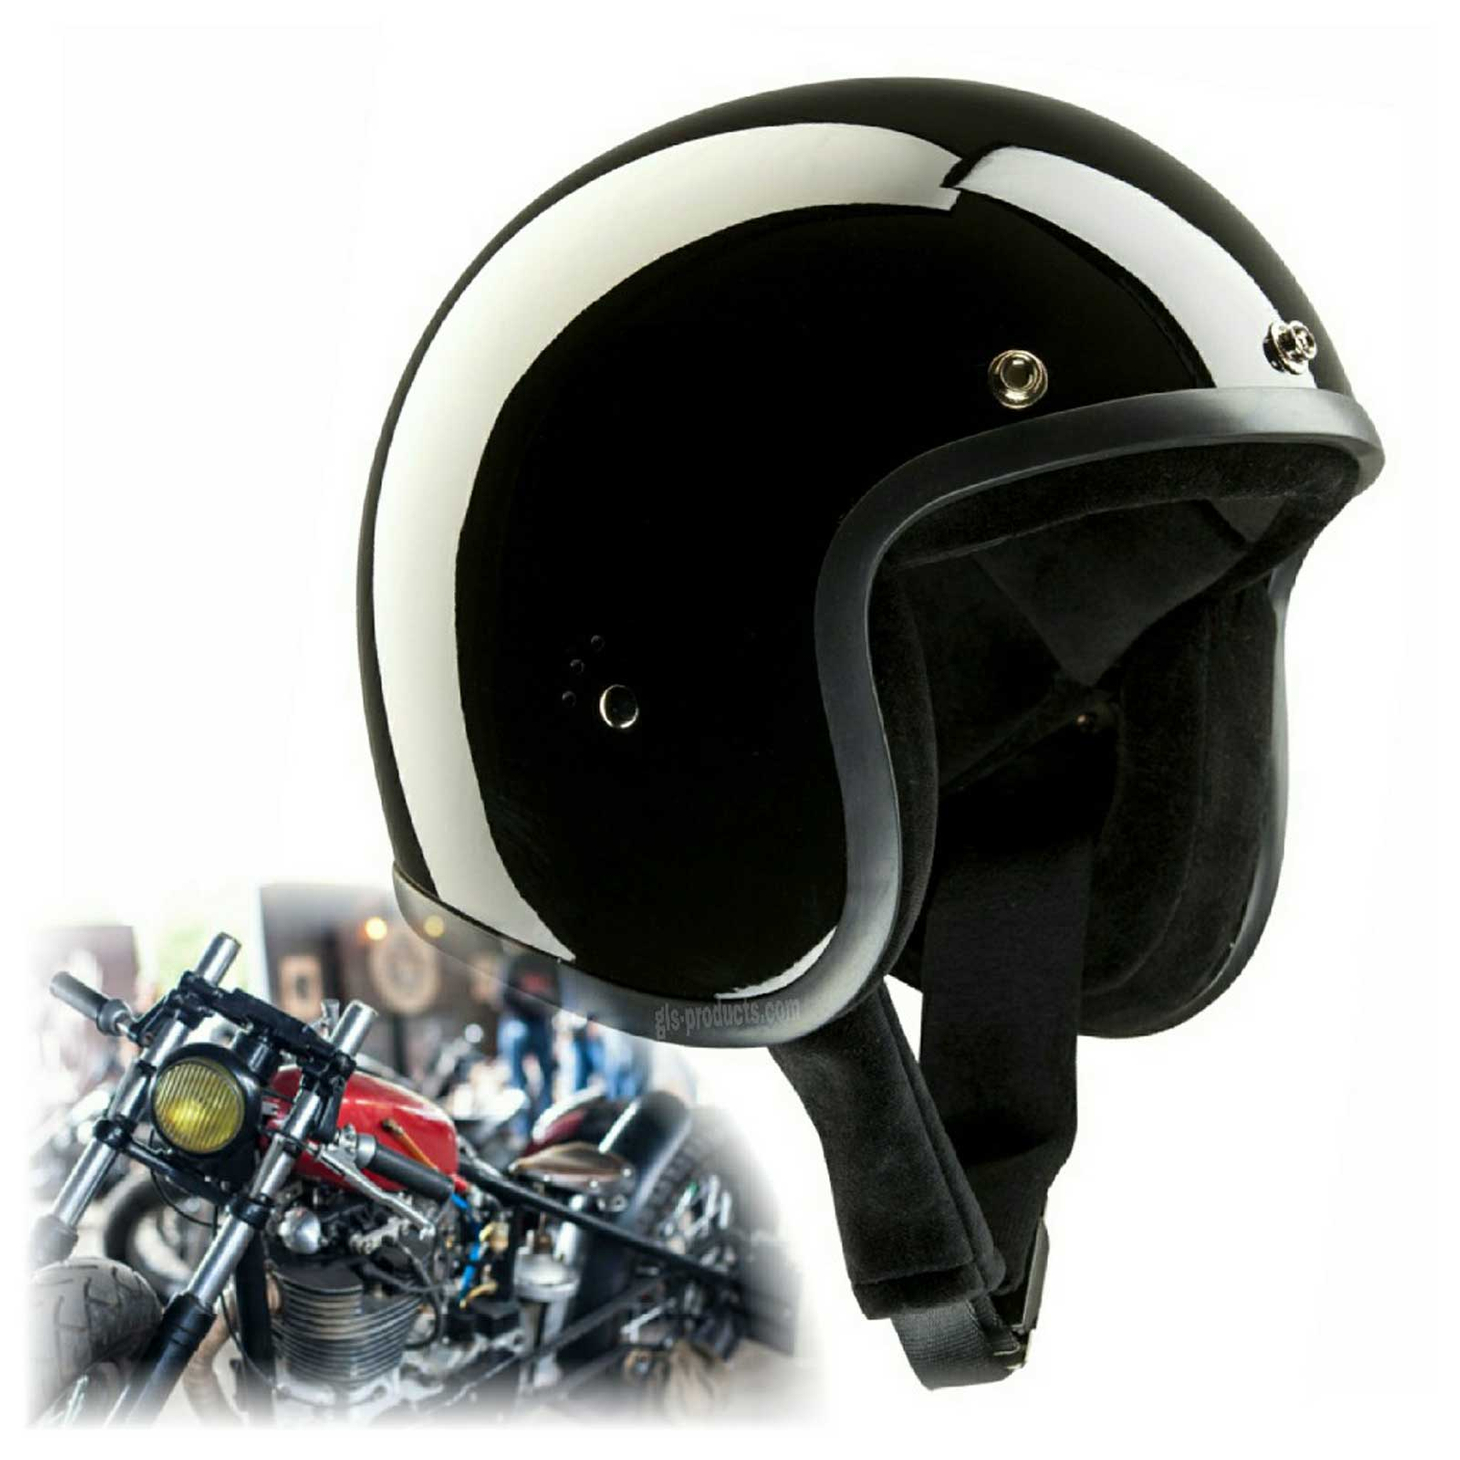 Bandit Jet Helmet - Glossy Black Motorcycle Open Face Helmet